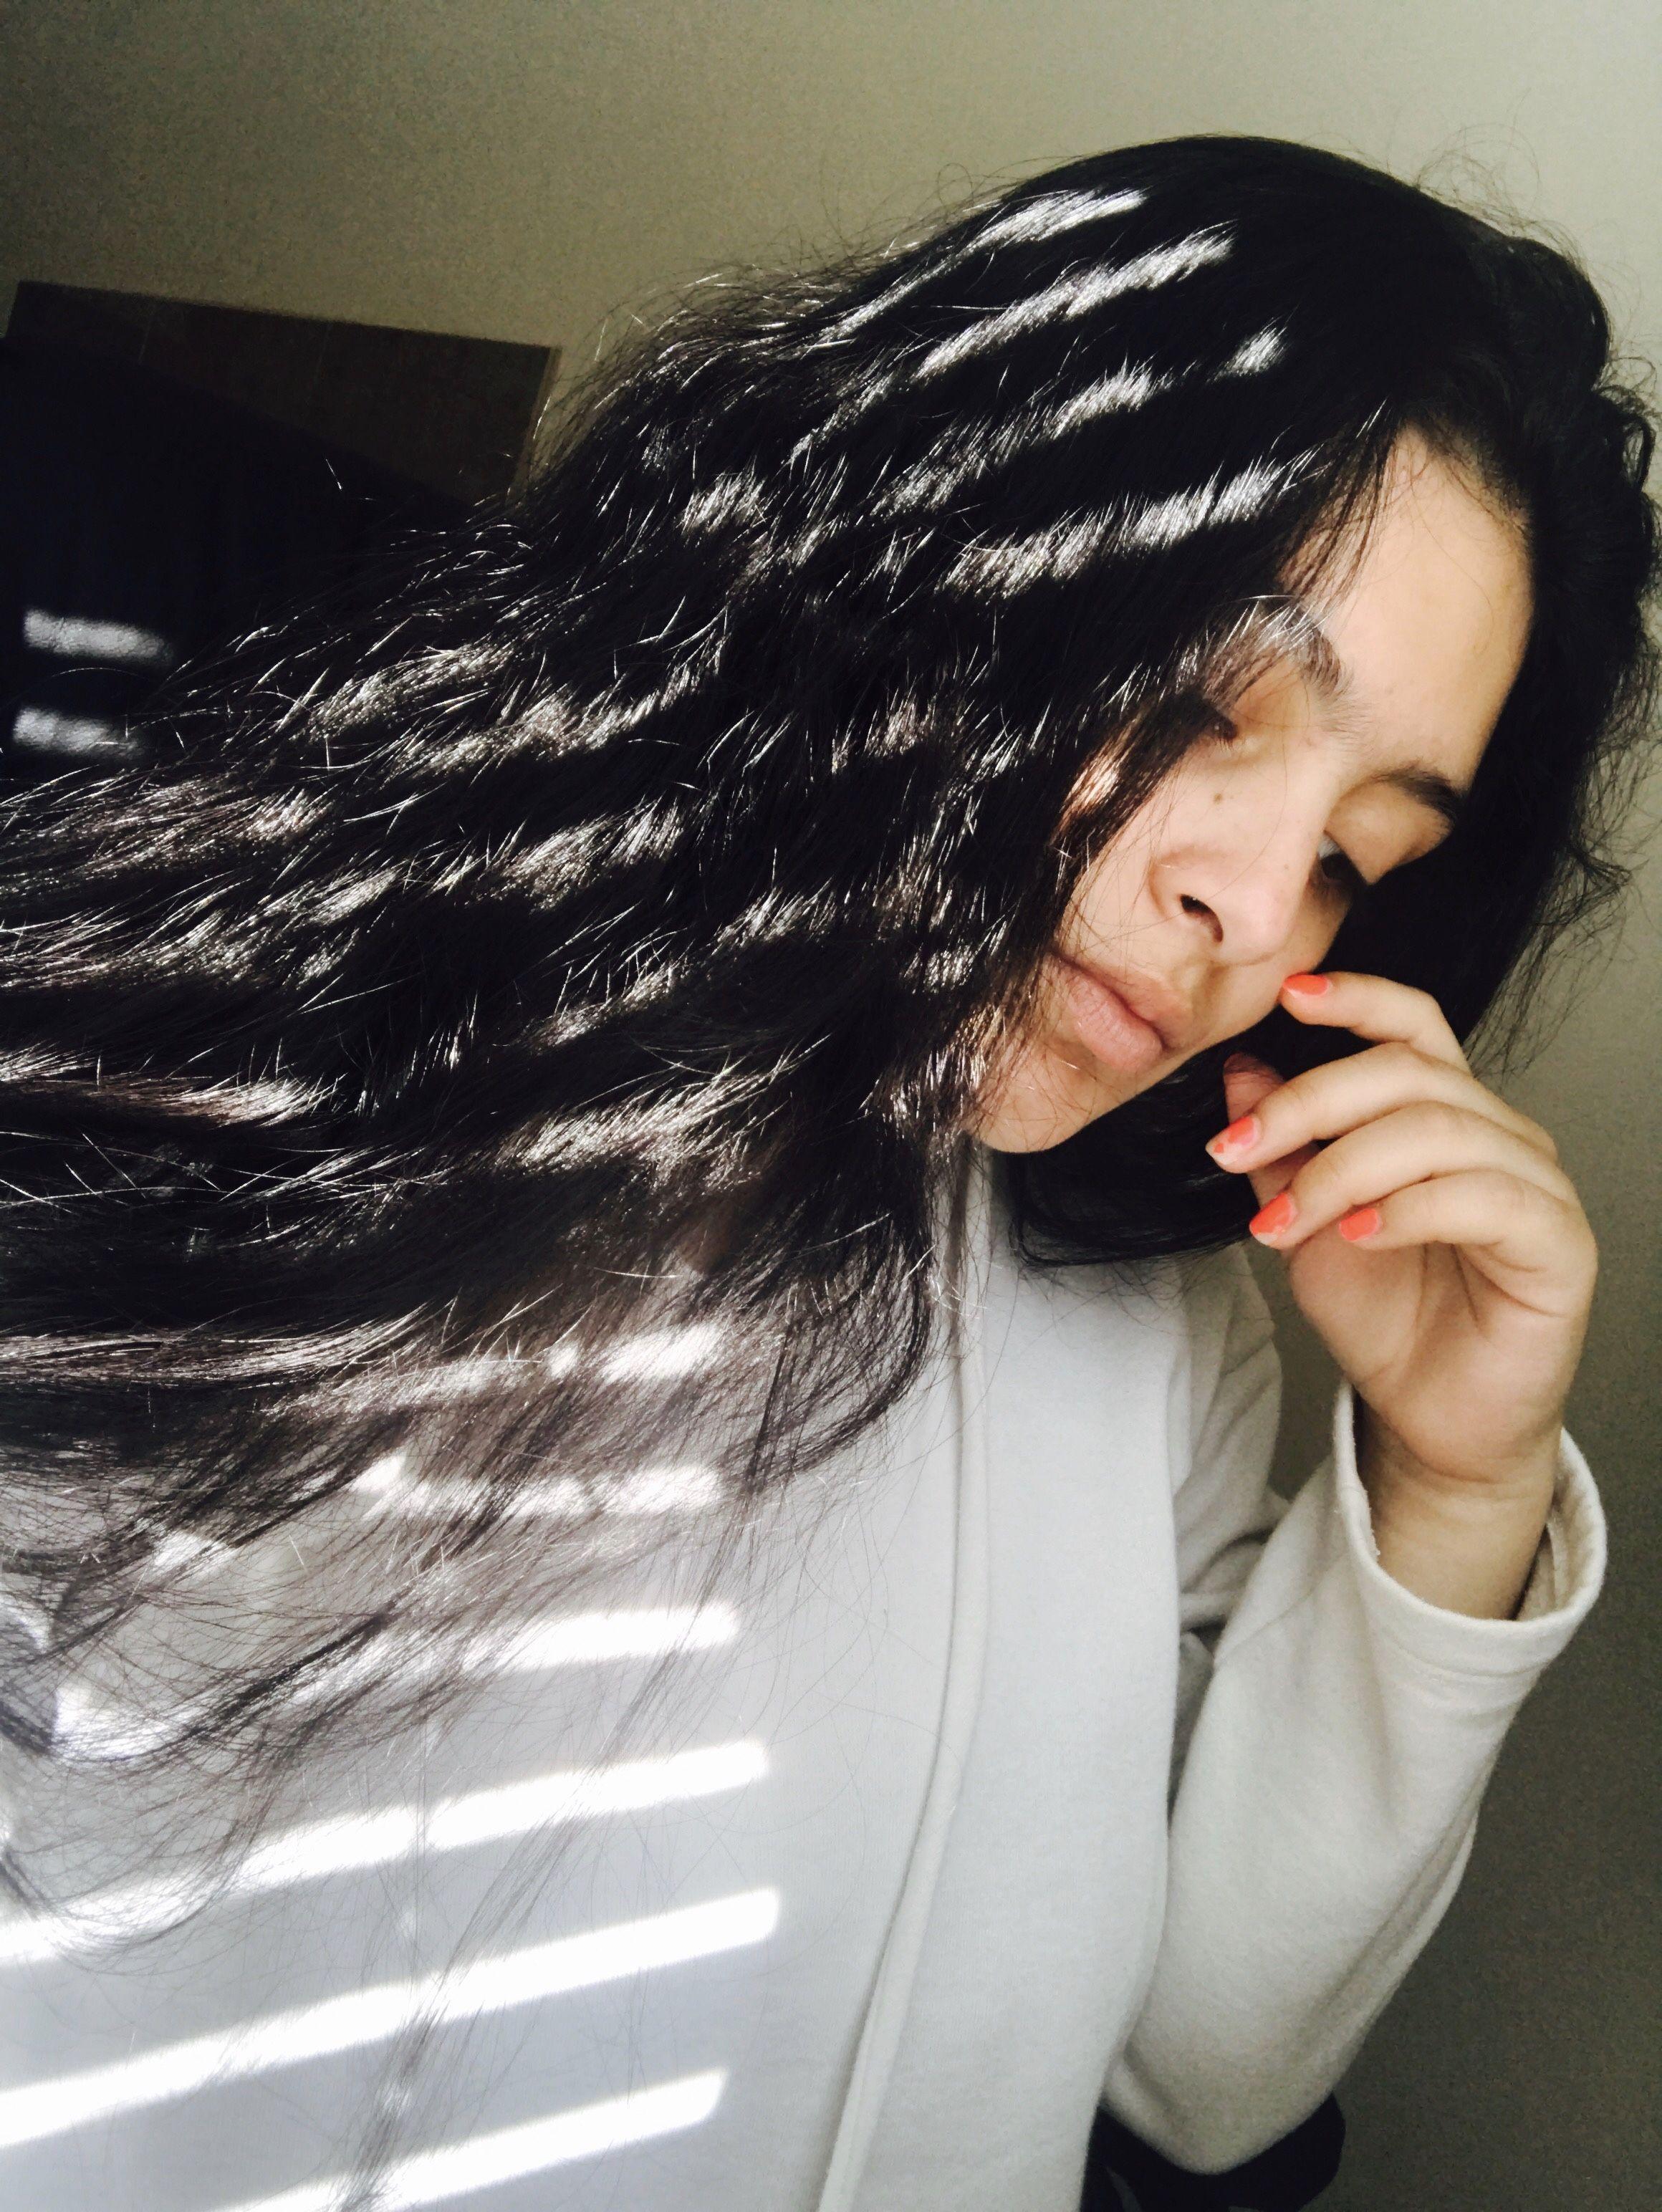 Camila Giraldo  Instagram:@camilagiraldoak